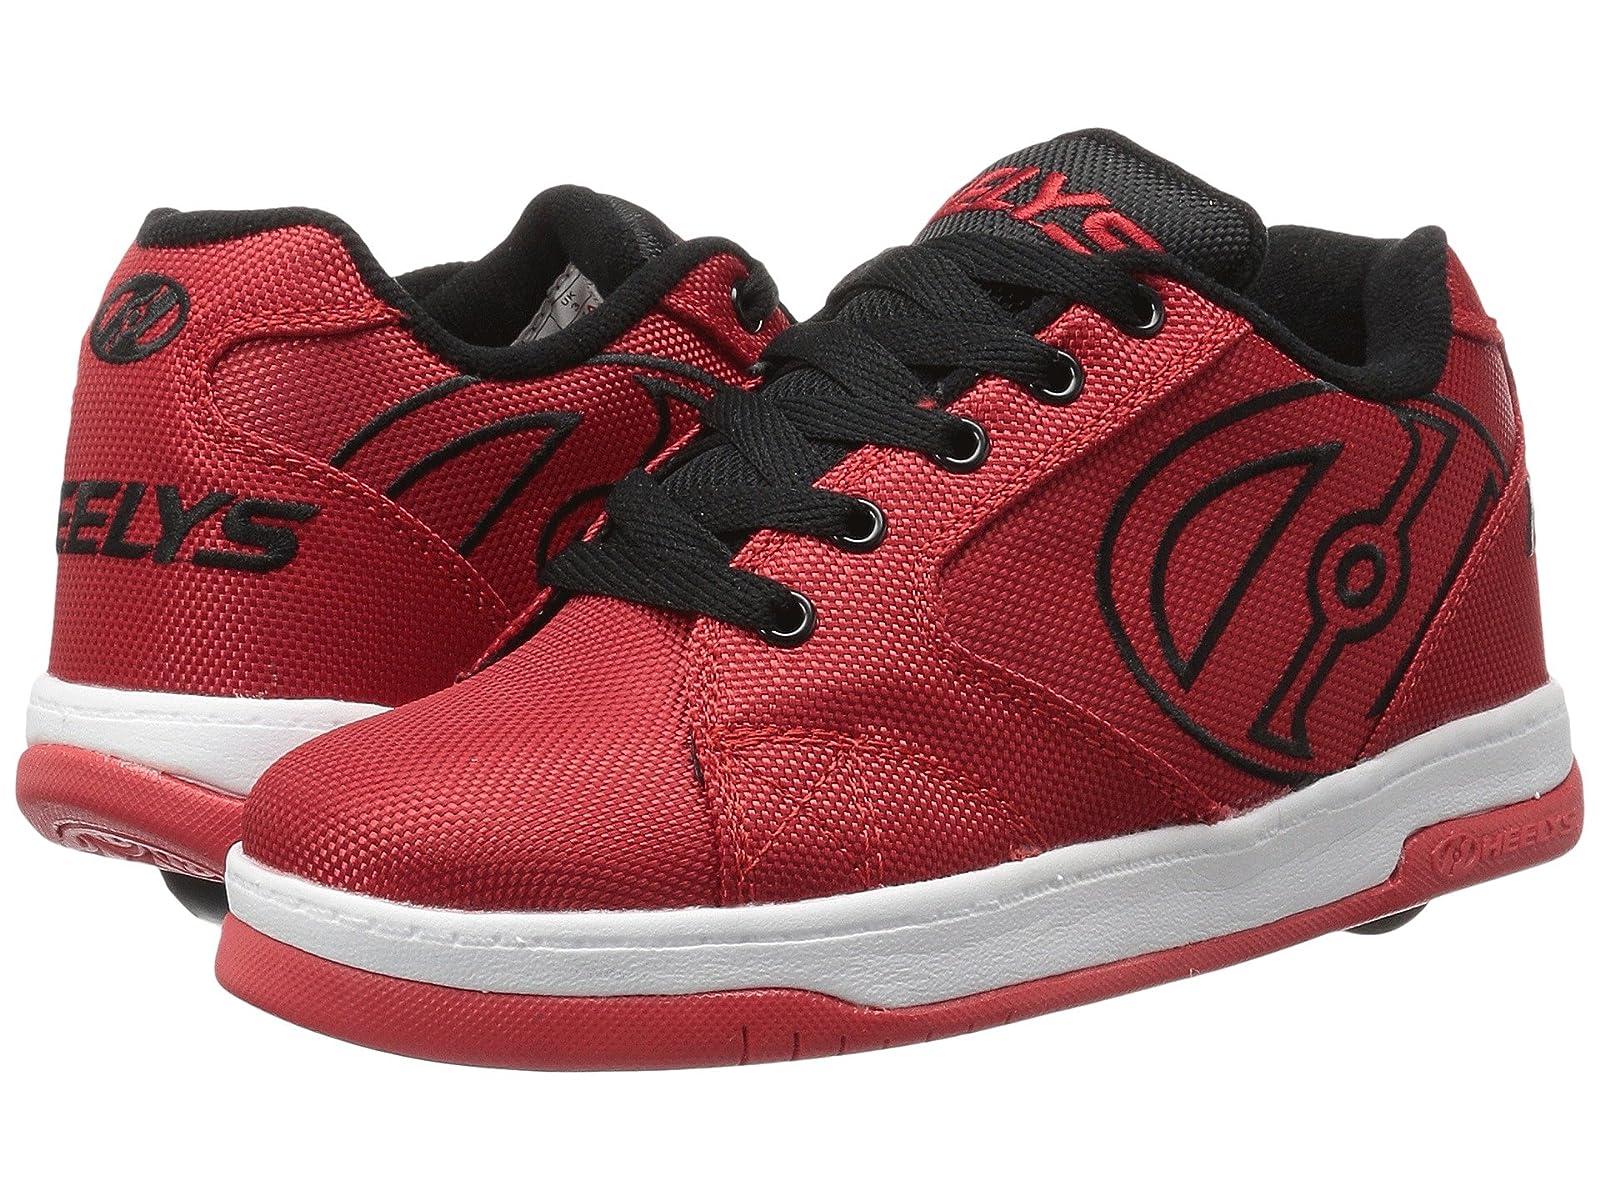 Heelys Propel 2.0 Ballistic (Little Kid/Big Kid/Adult)Cheap and distinctive eye-catching shoes